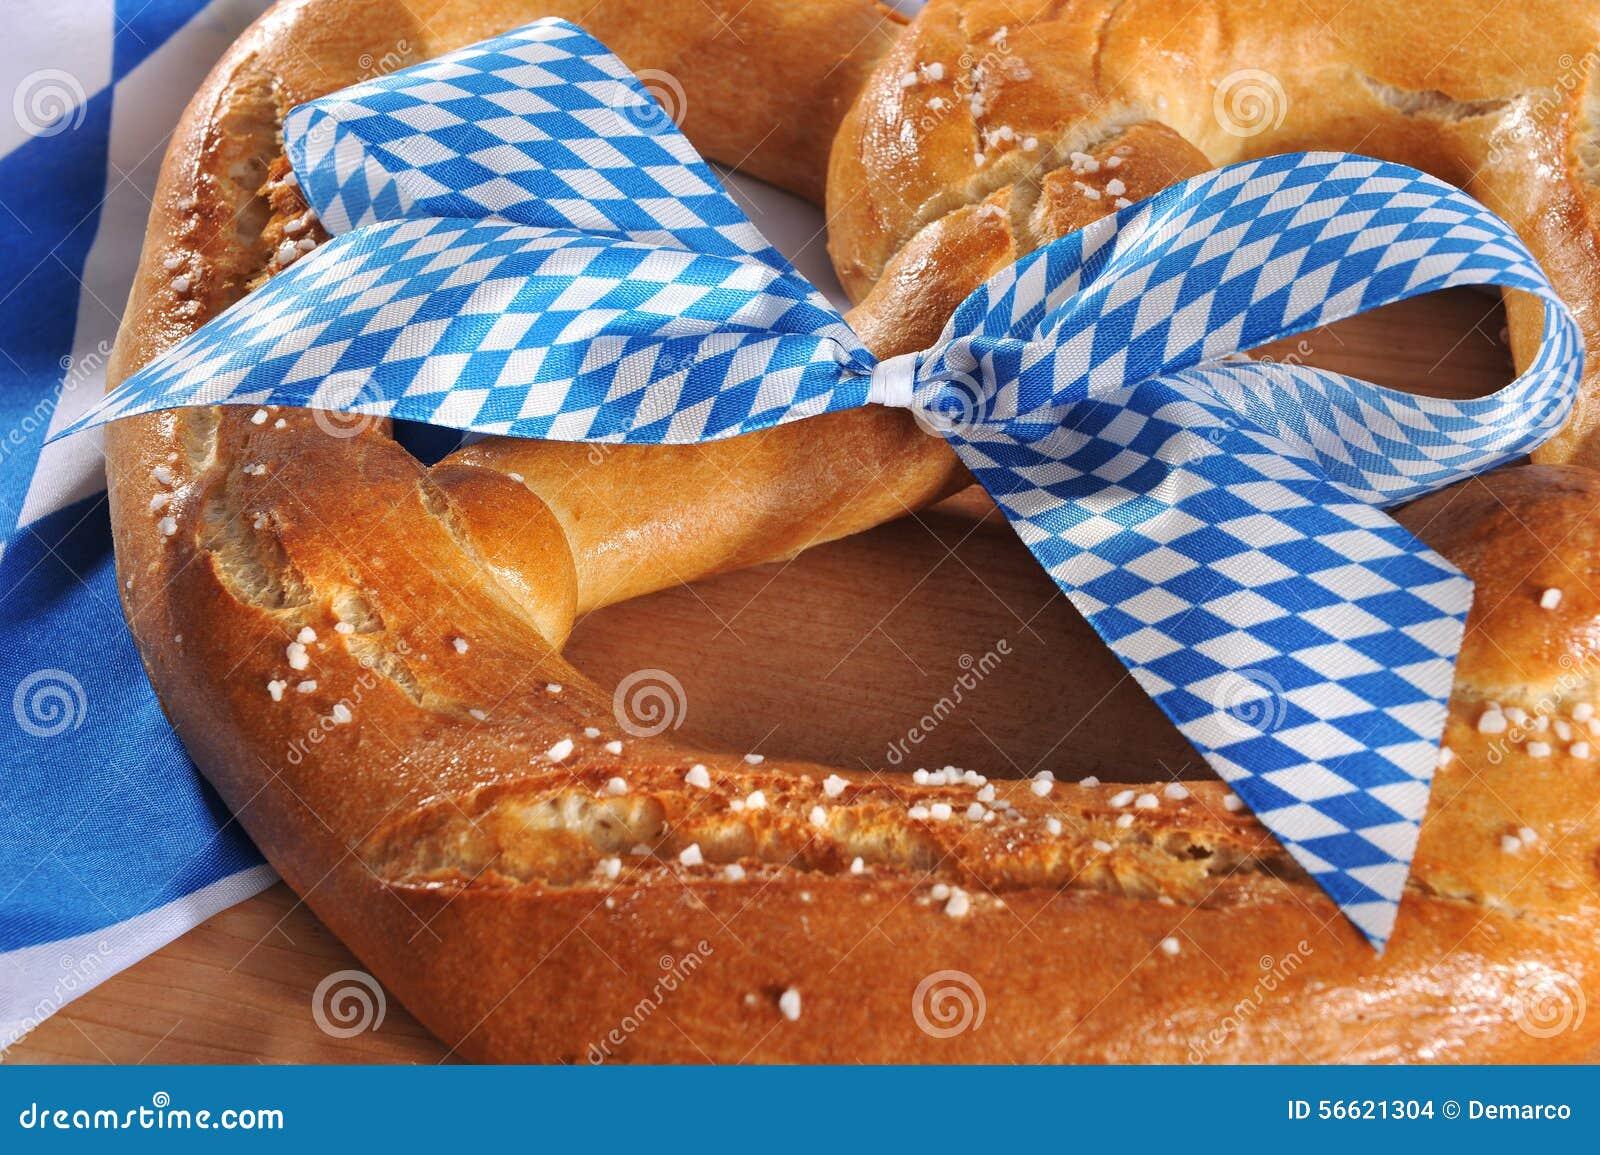 Big Bavarian Oktoberfest soft pretzel